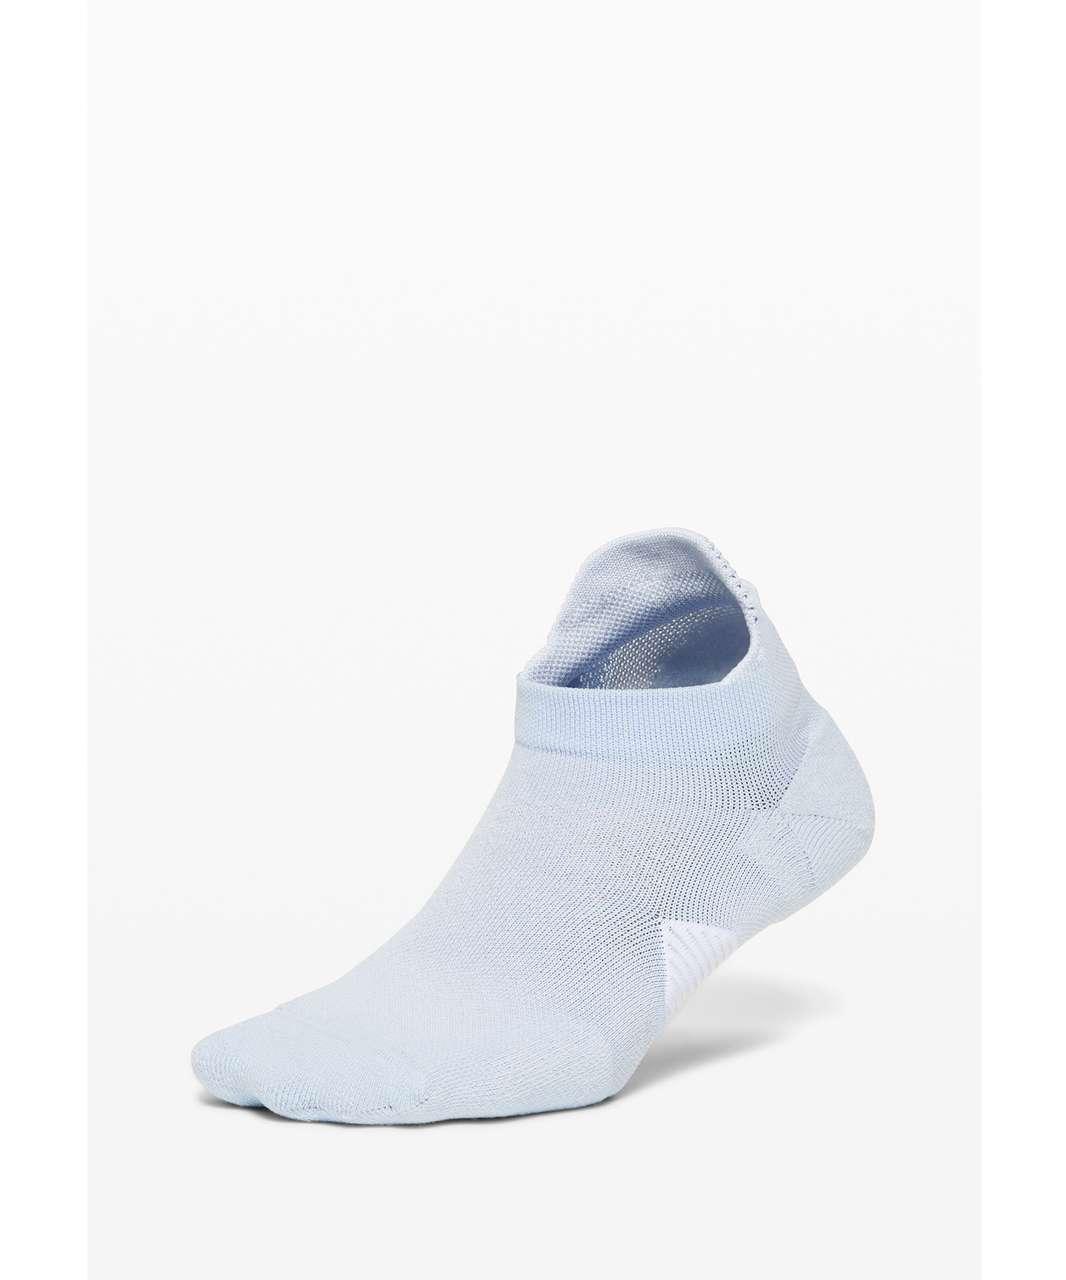 Lululemon Speed Sock *Silver - Daydream / White